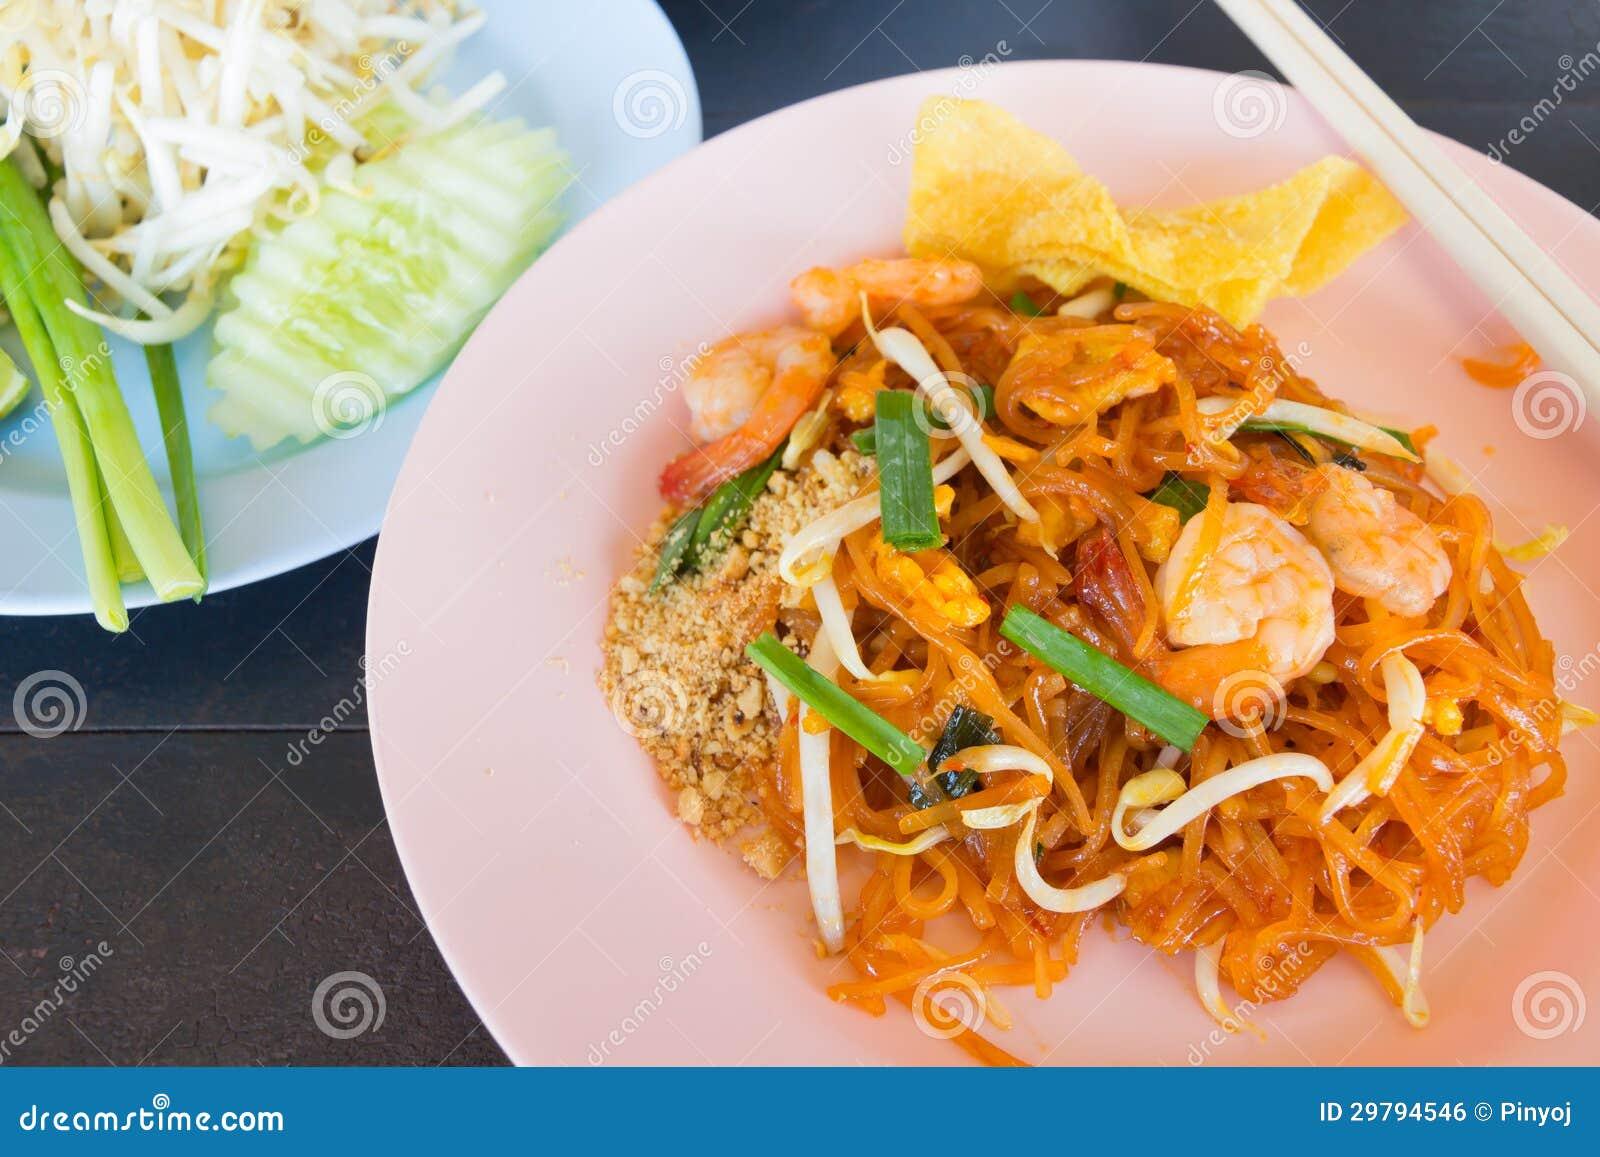 Stir-fried rice noodles (Pad Thai)